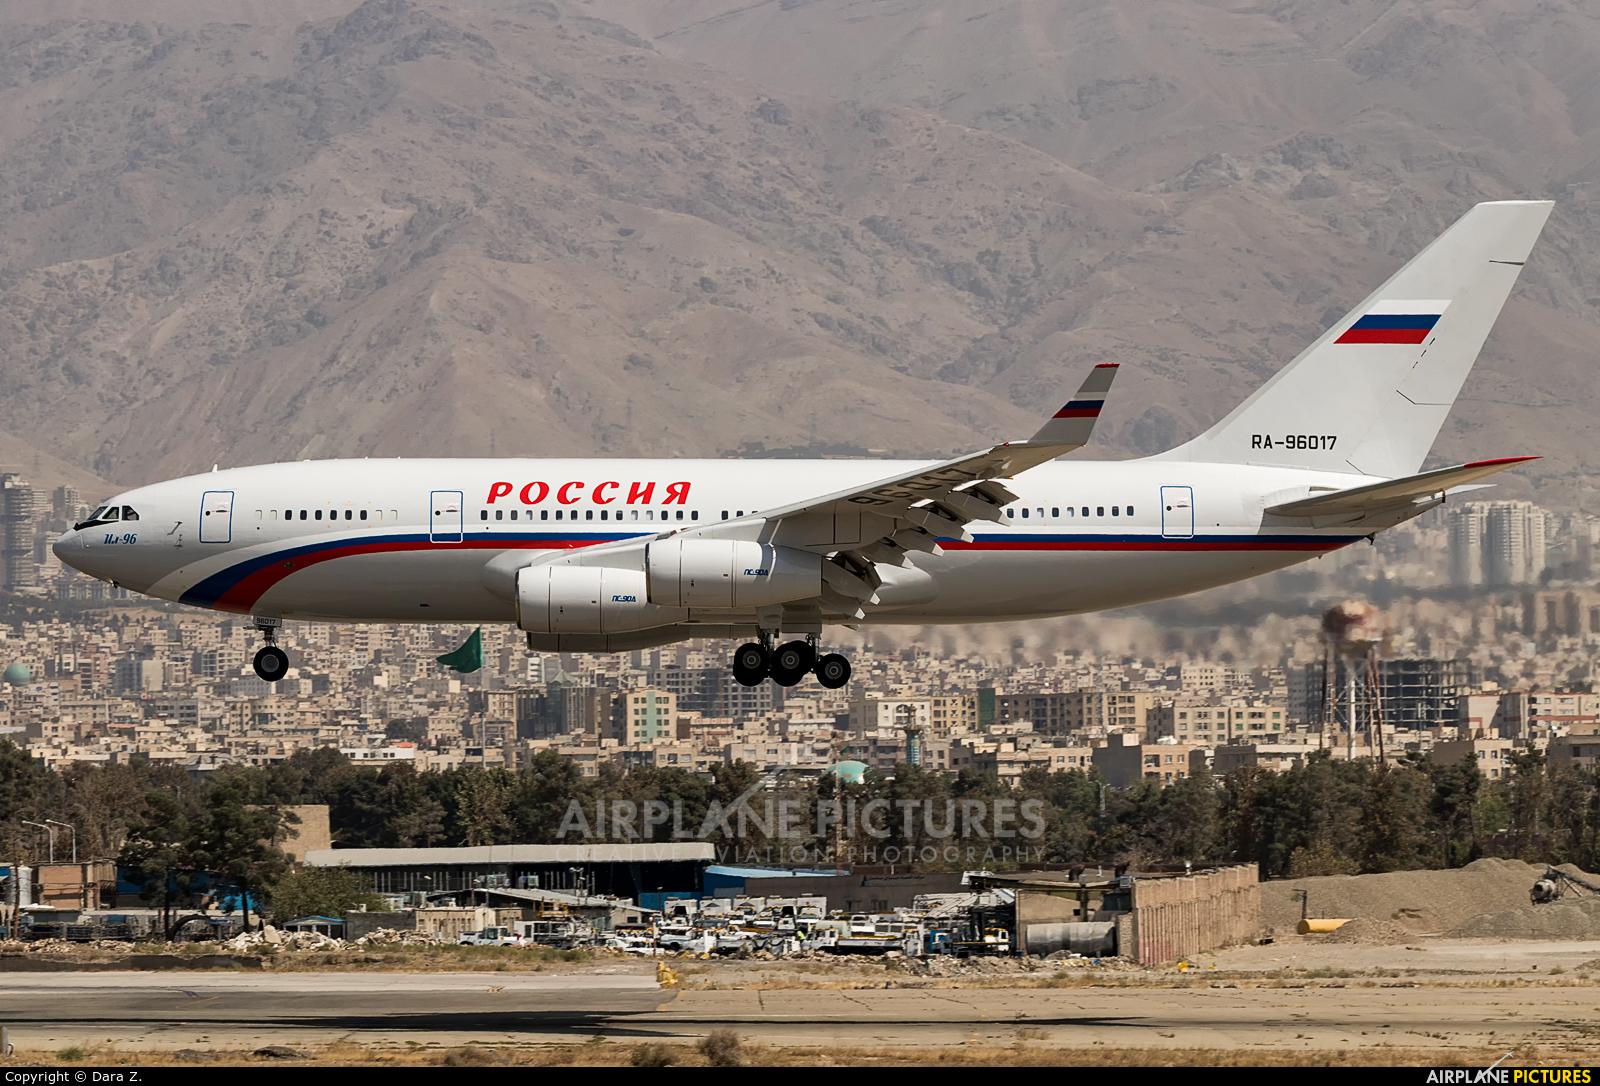 Rossiya RA-96017 aircraft at Tehran - Mehrabad Intl